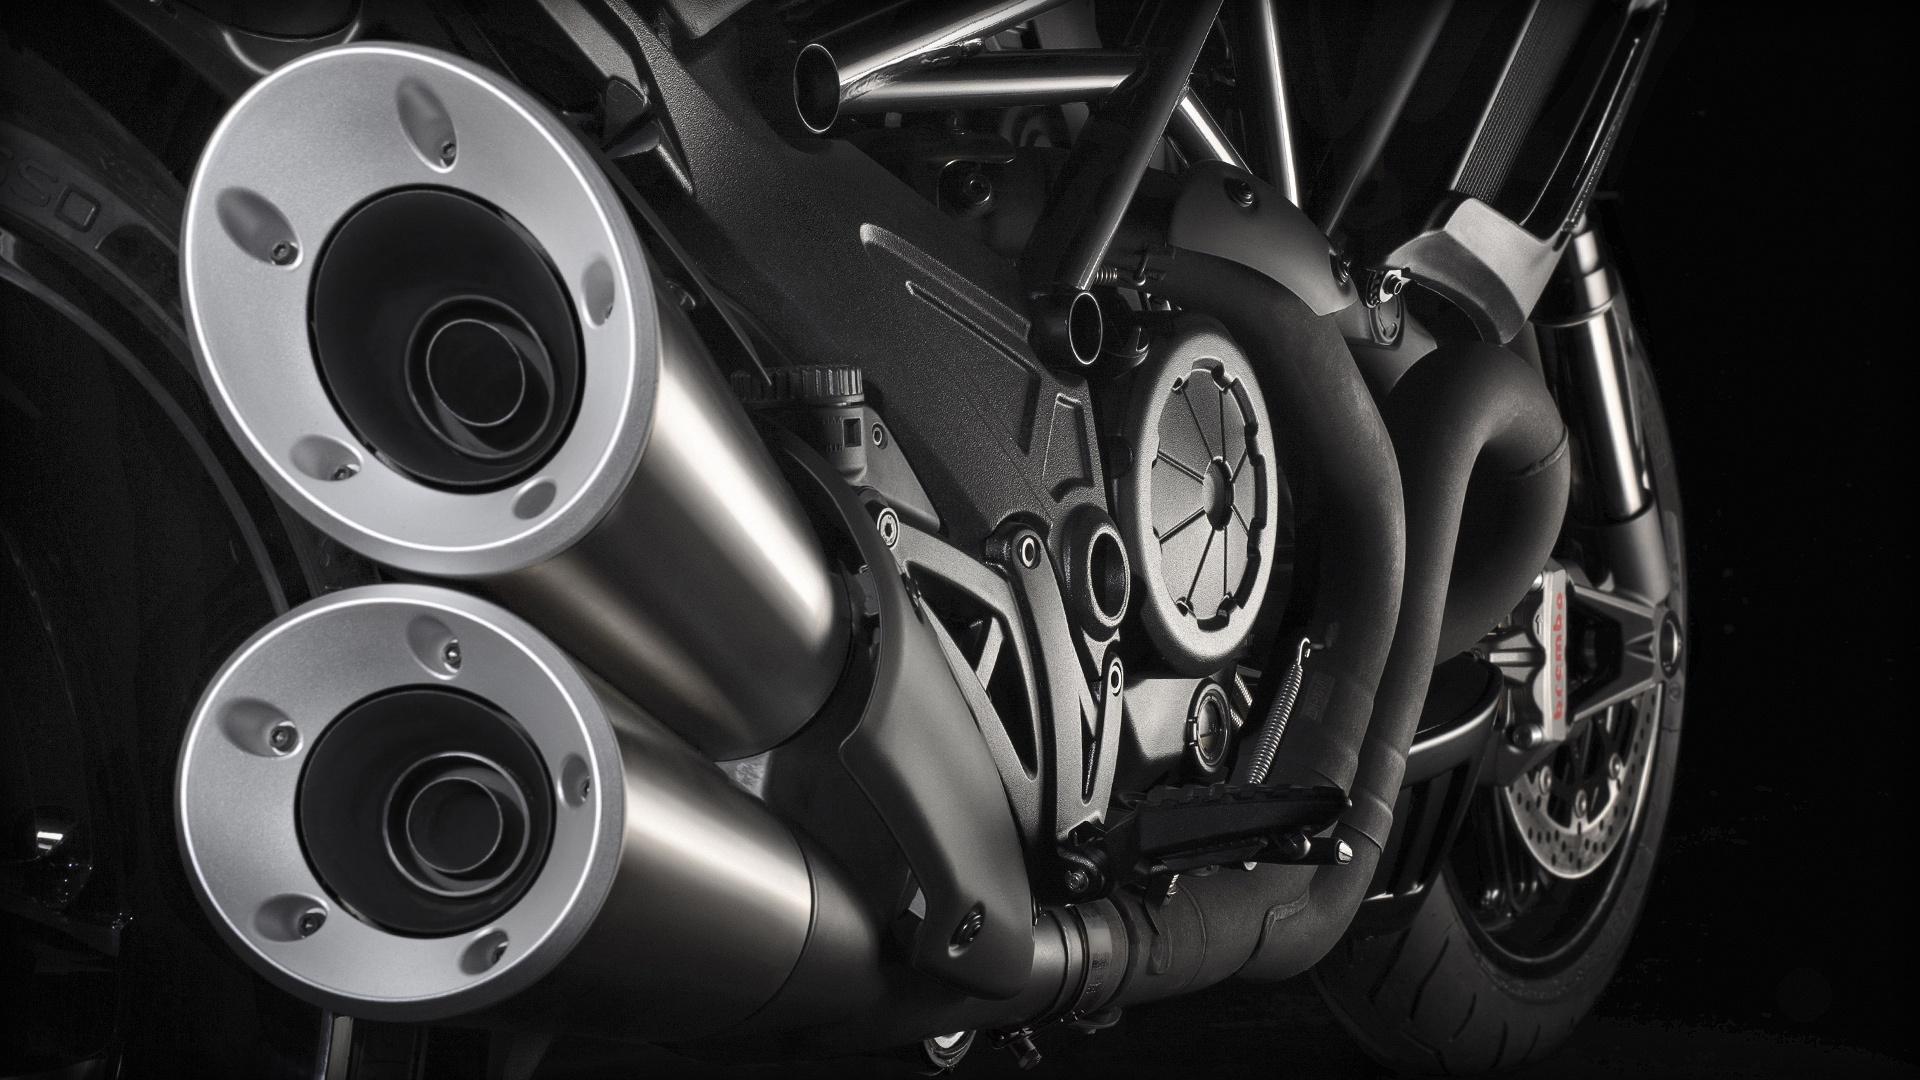 МОТОЦИКЛ DUCATI DIAVEL CARBON ― Артмото - купить квадроцикл в украине и харькове, мотоцикл, снегоход, скутер, мопед, электромобиль